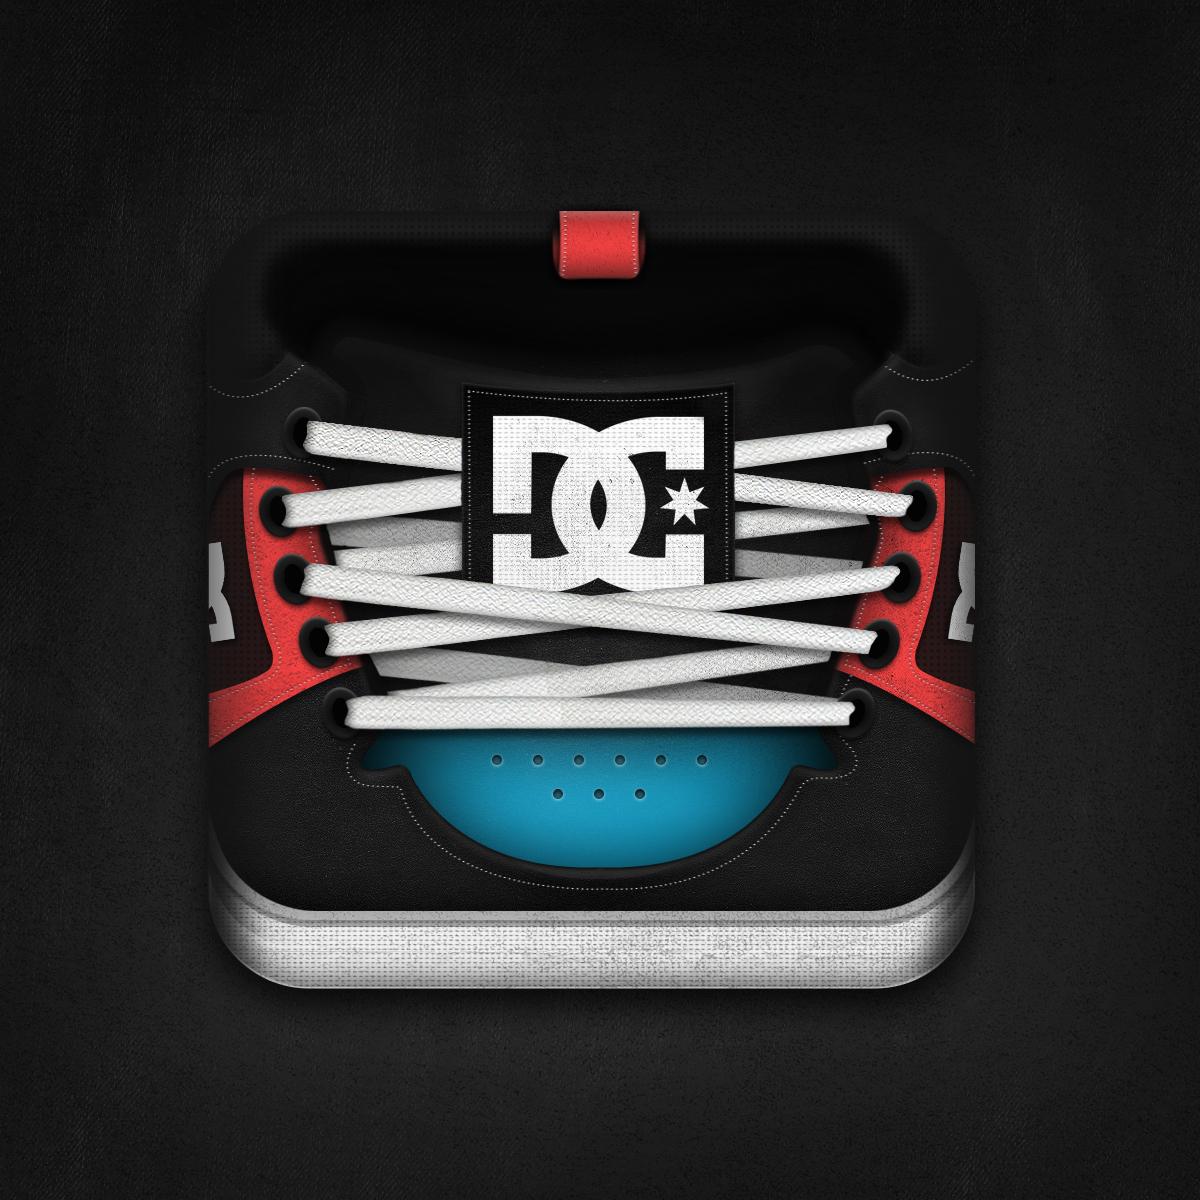 鞋子系列图标icon设计(二)